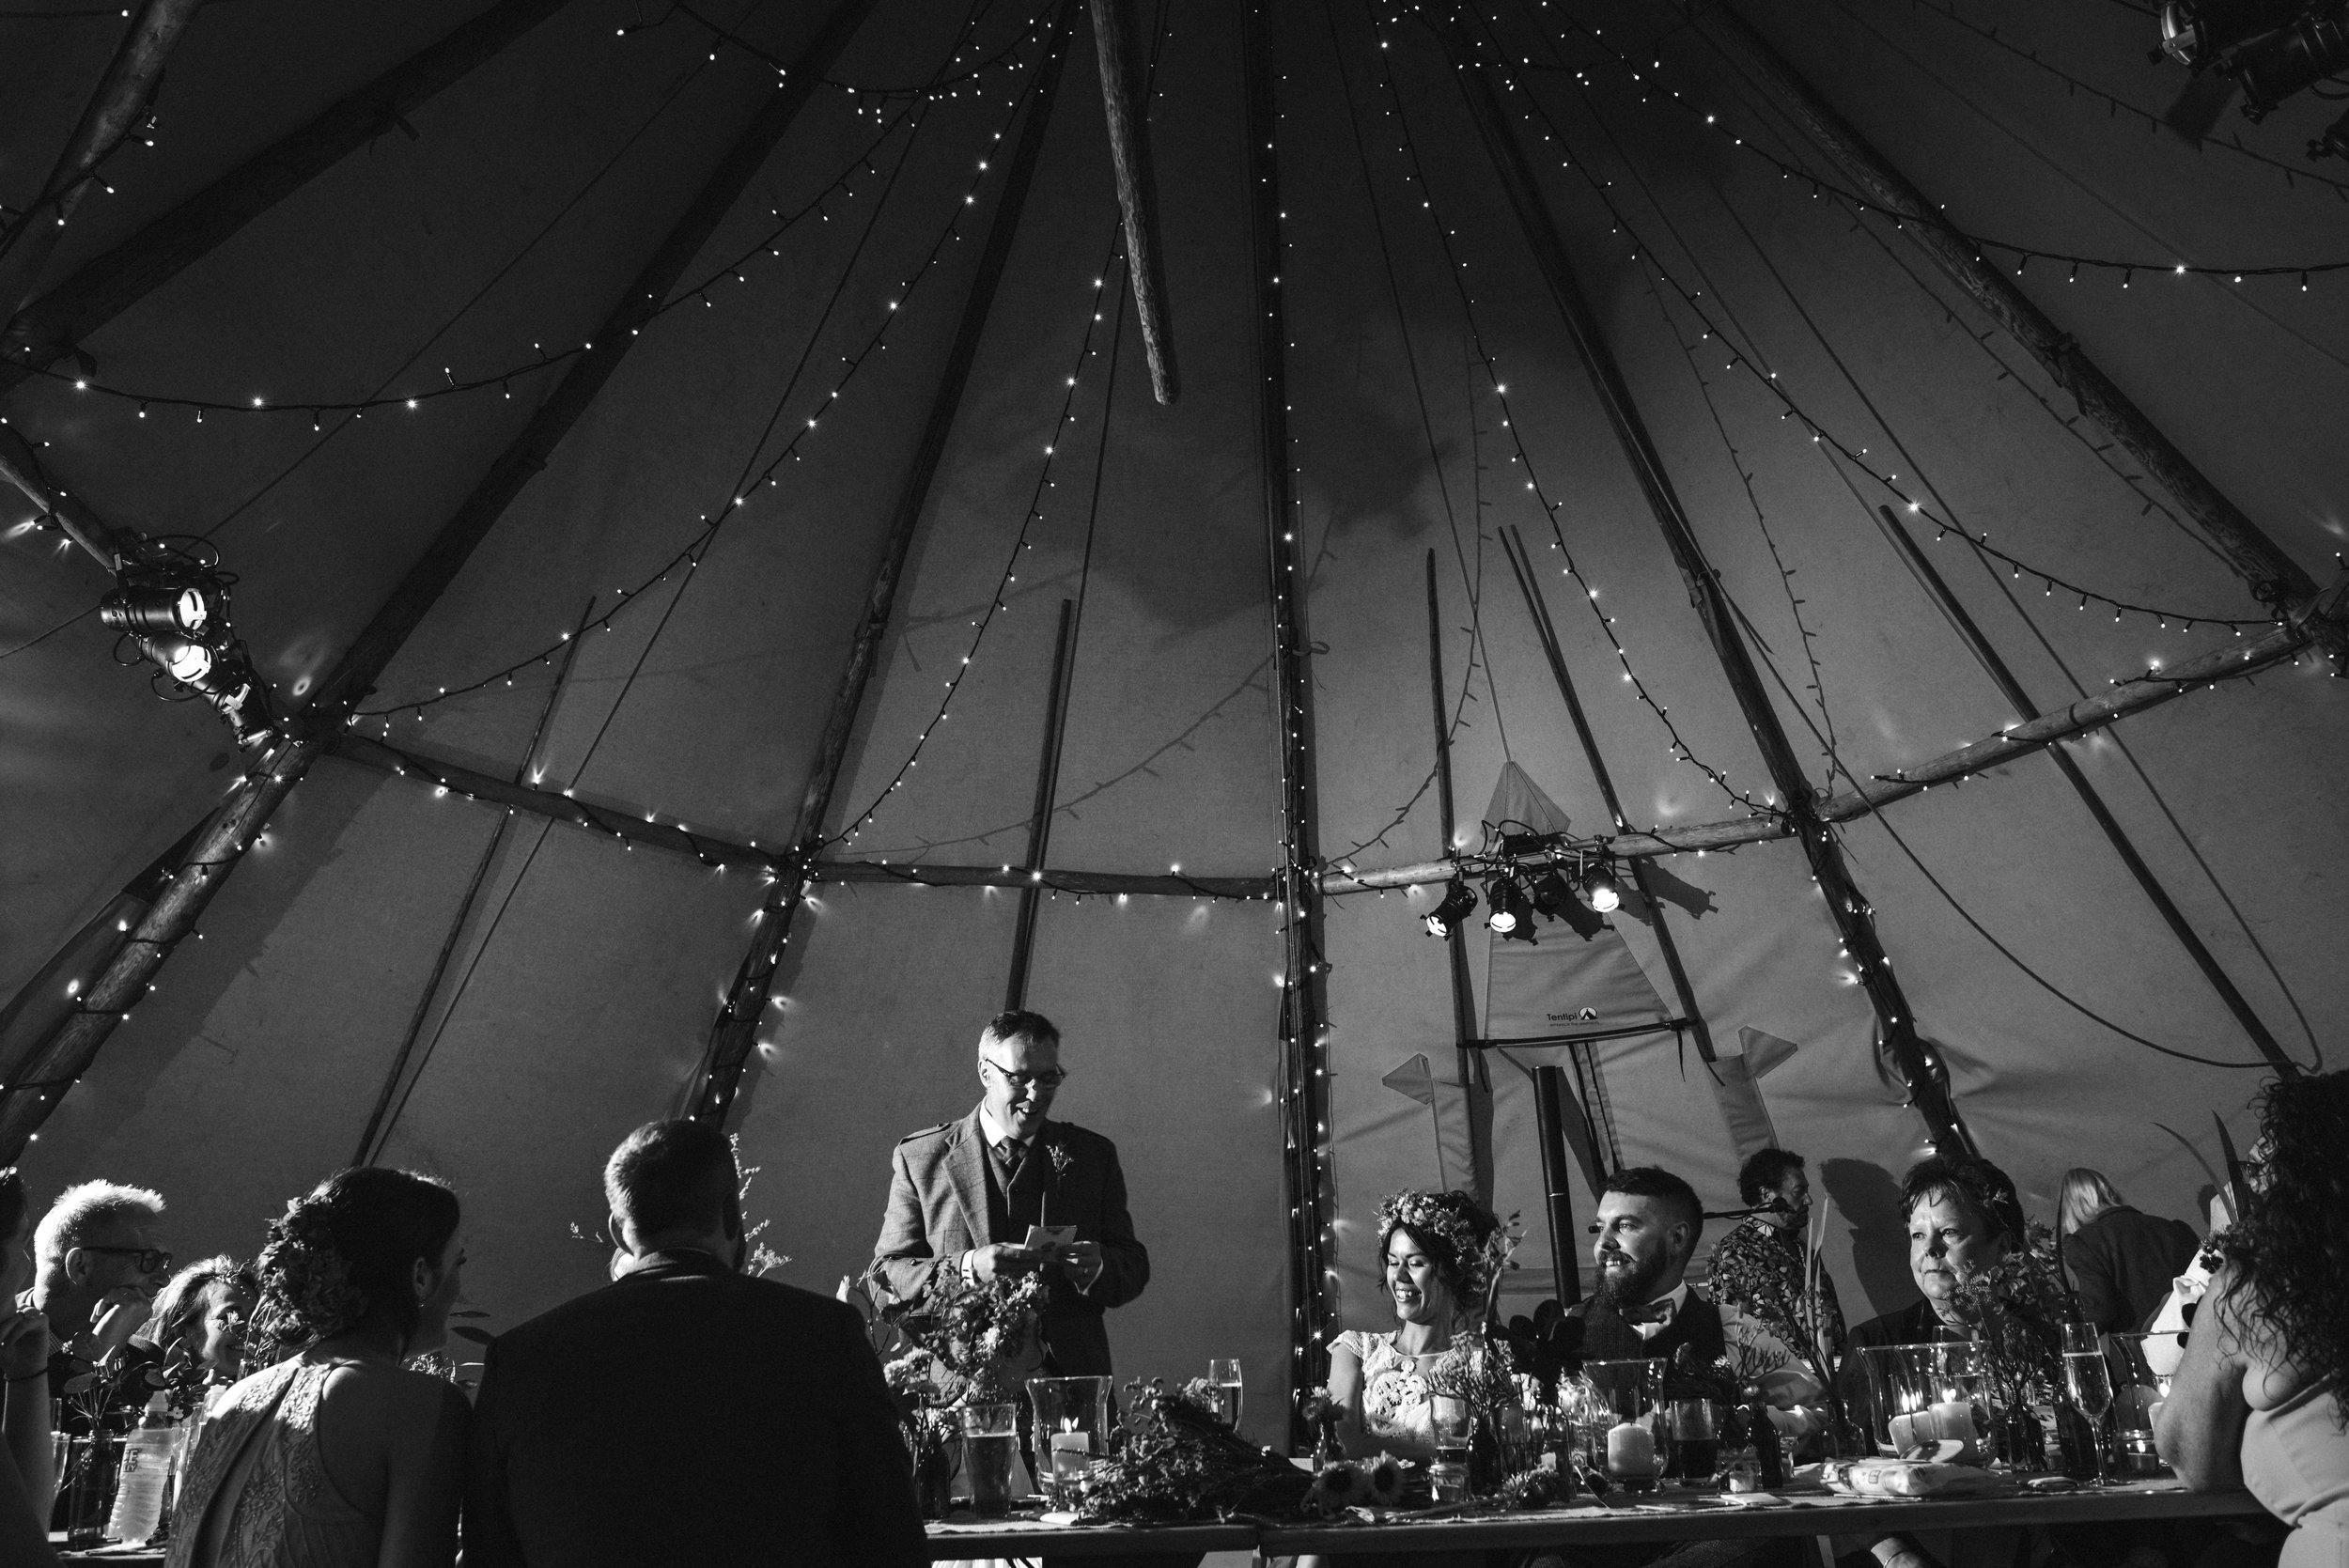 pengenna-manor-wedding-photographer-51.jpg